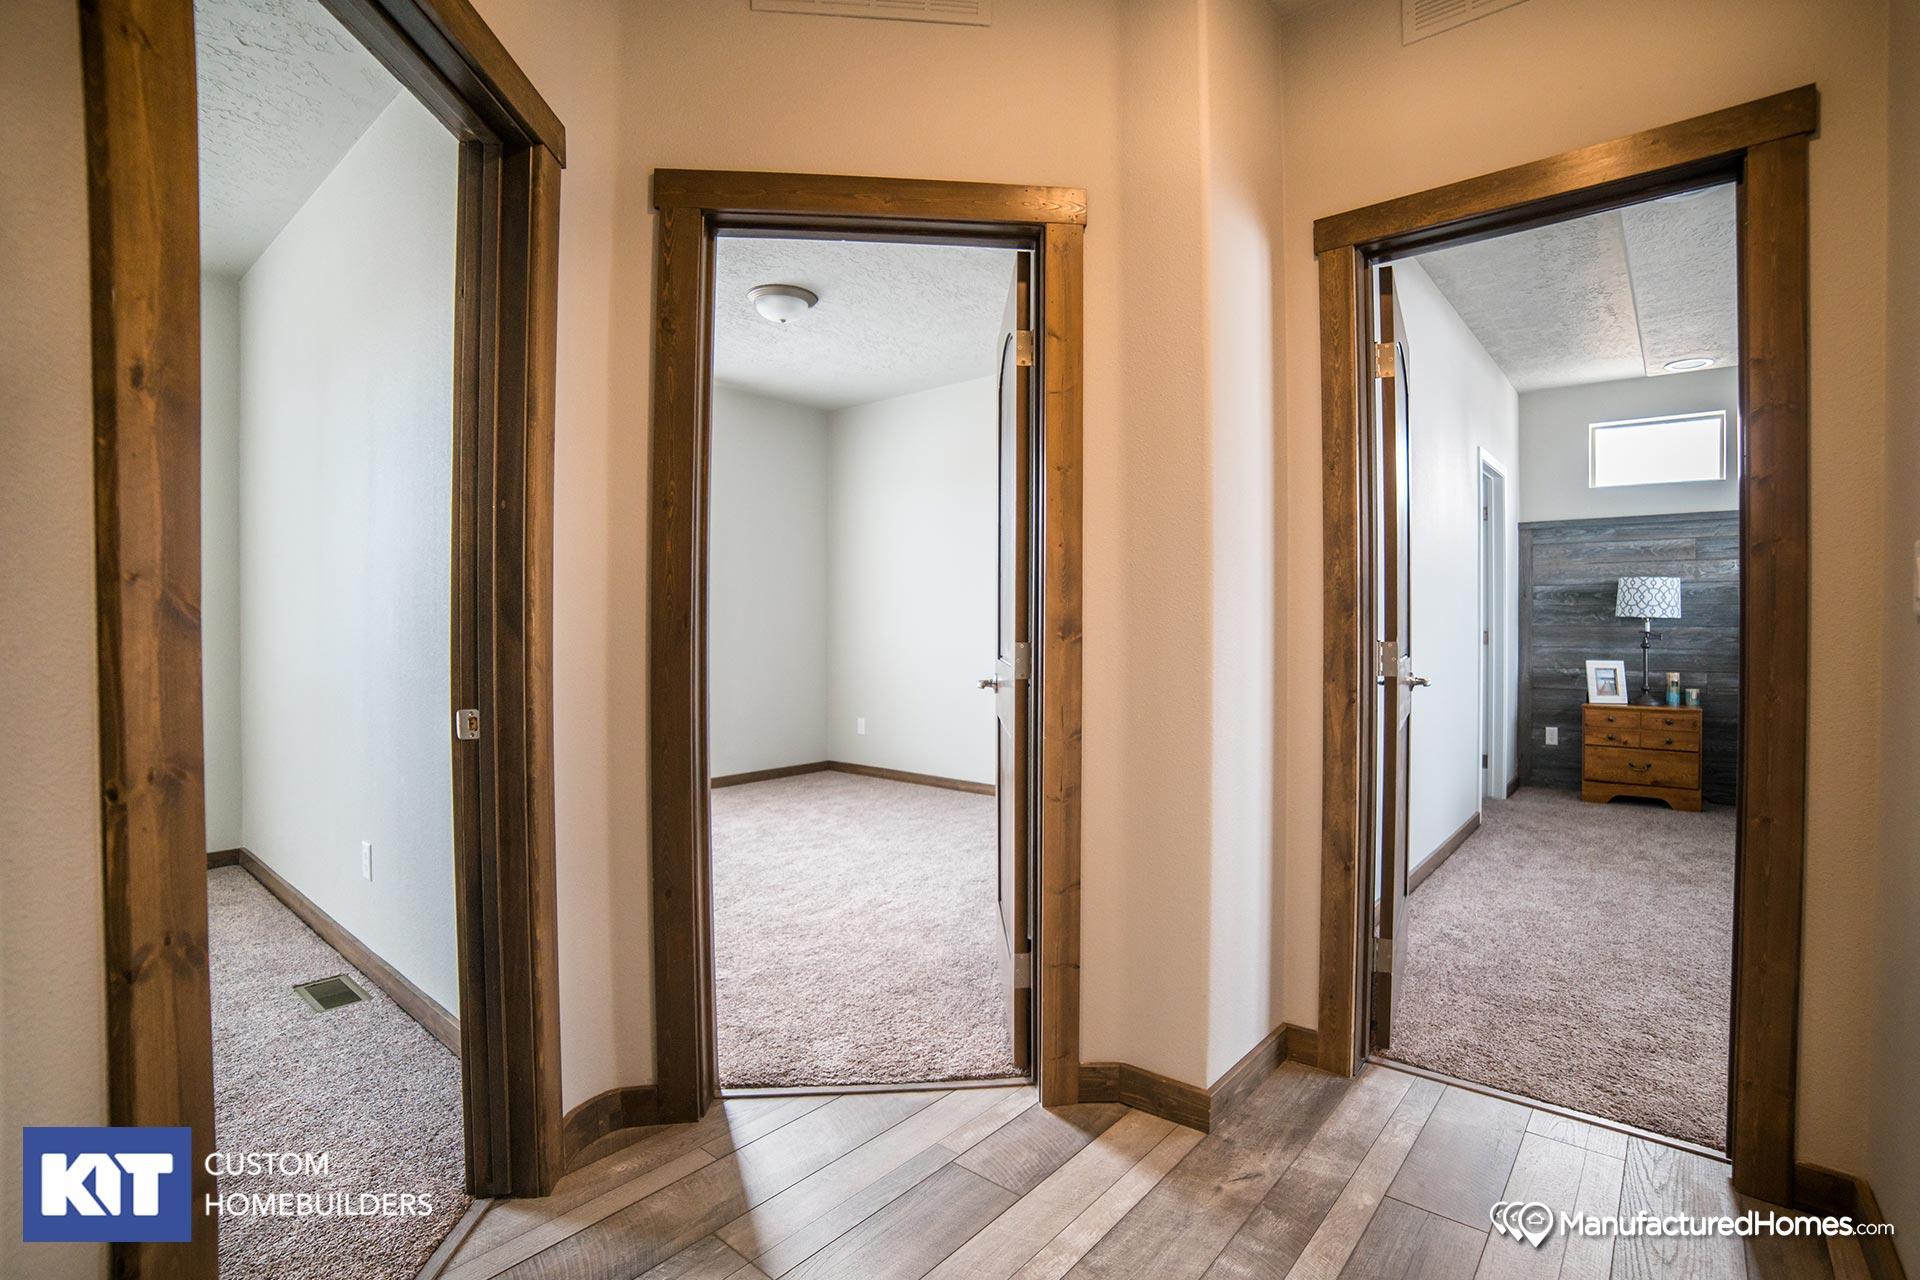 Grand Manor / 6009 - Interior